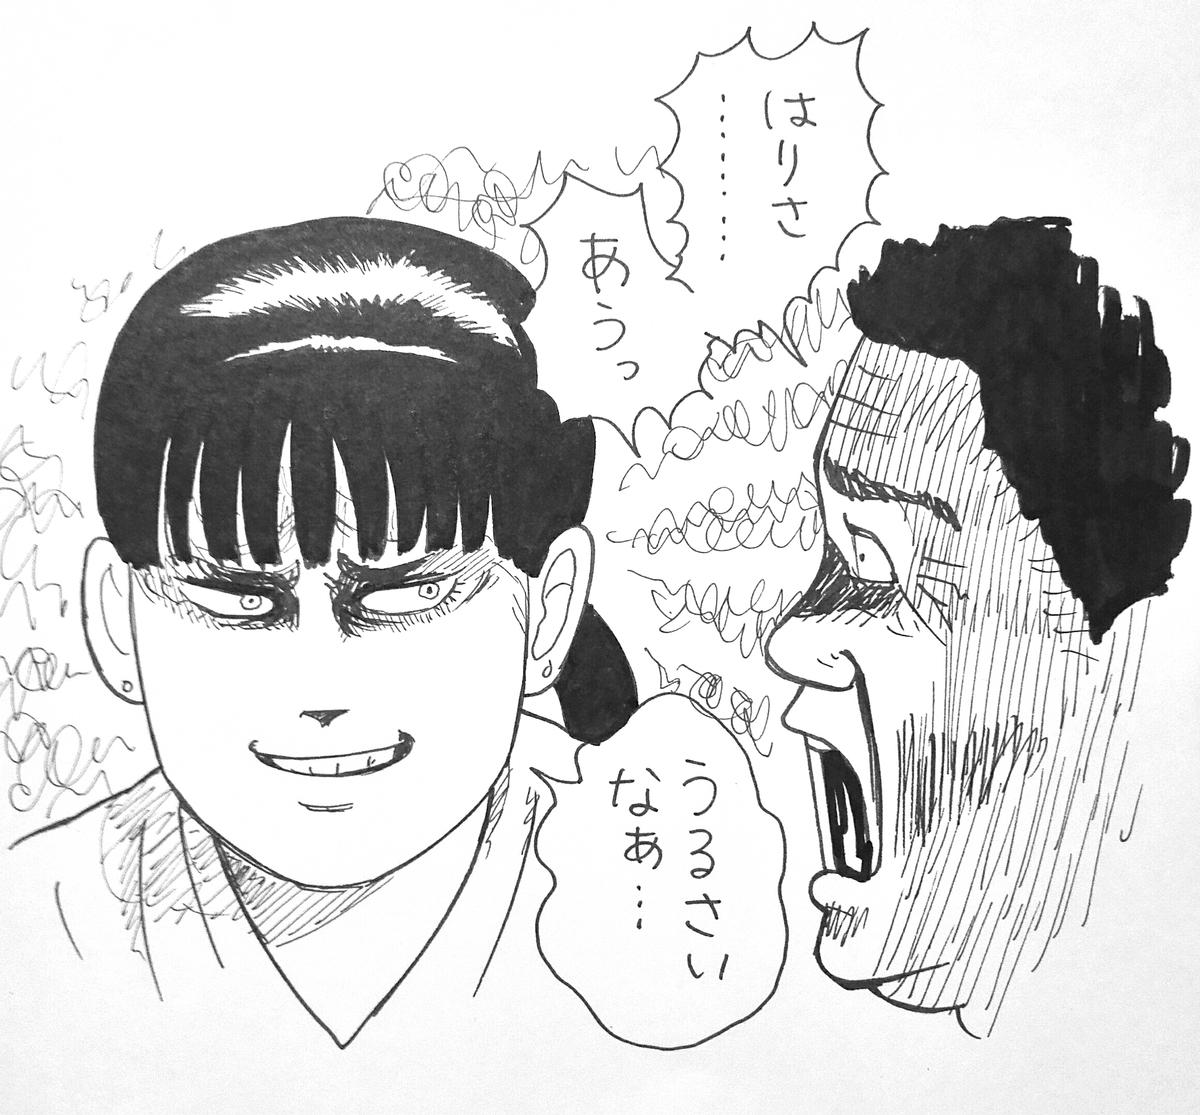 f:id:Shoko_drawing:20190813220044j:plain